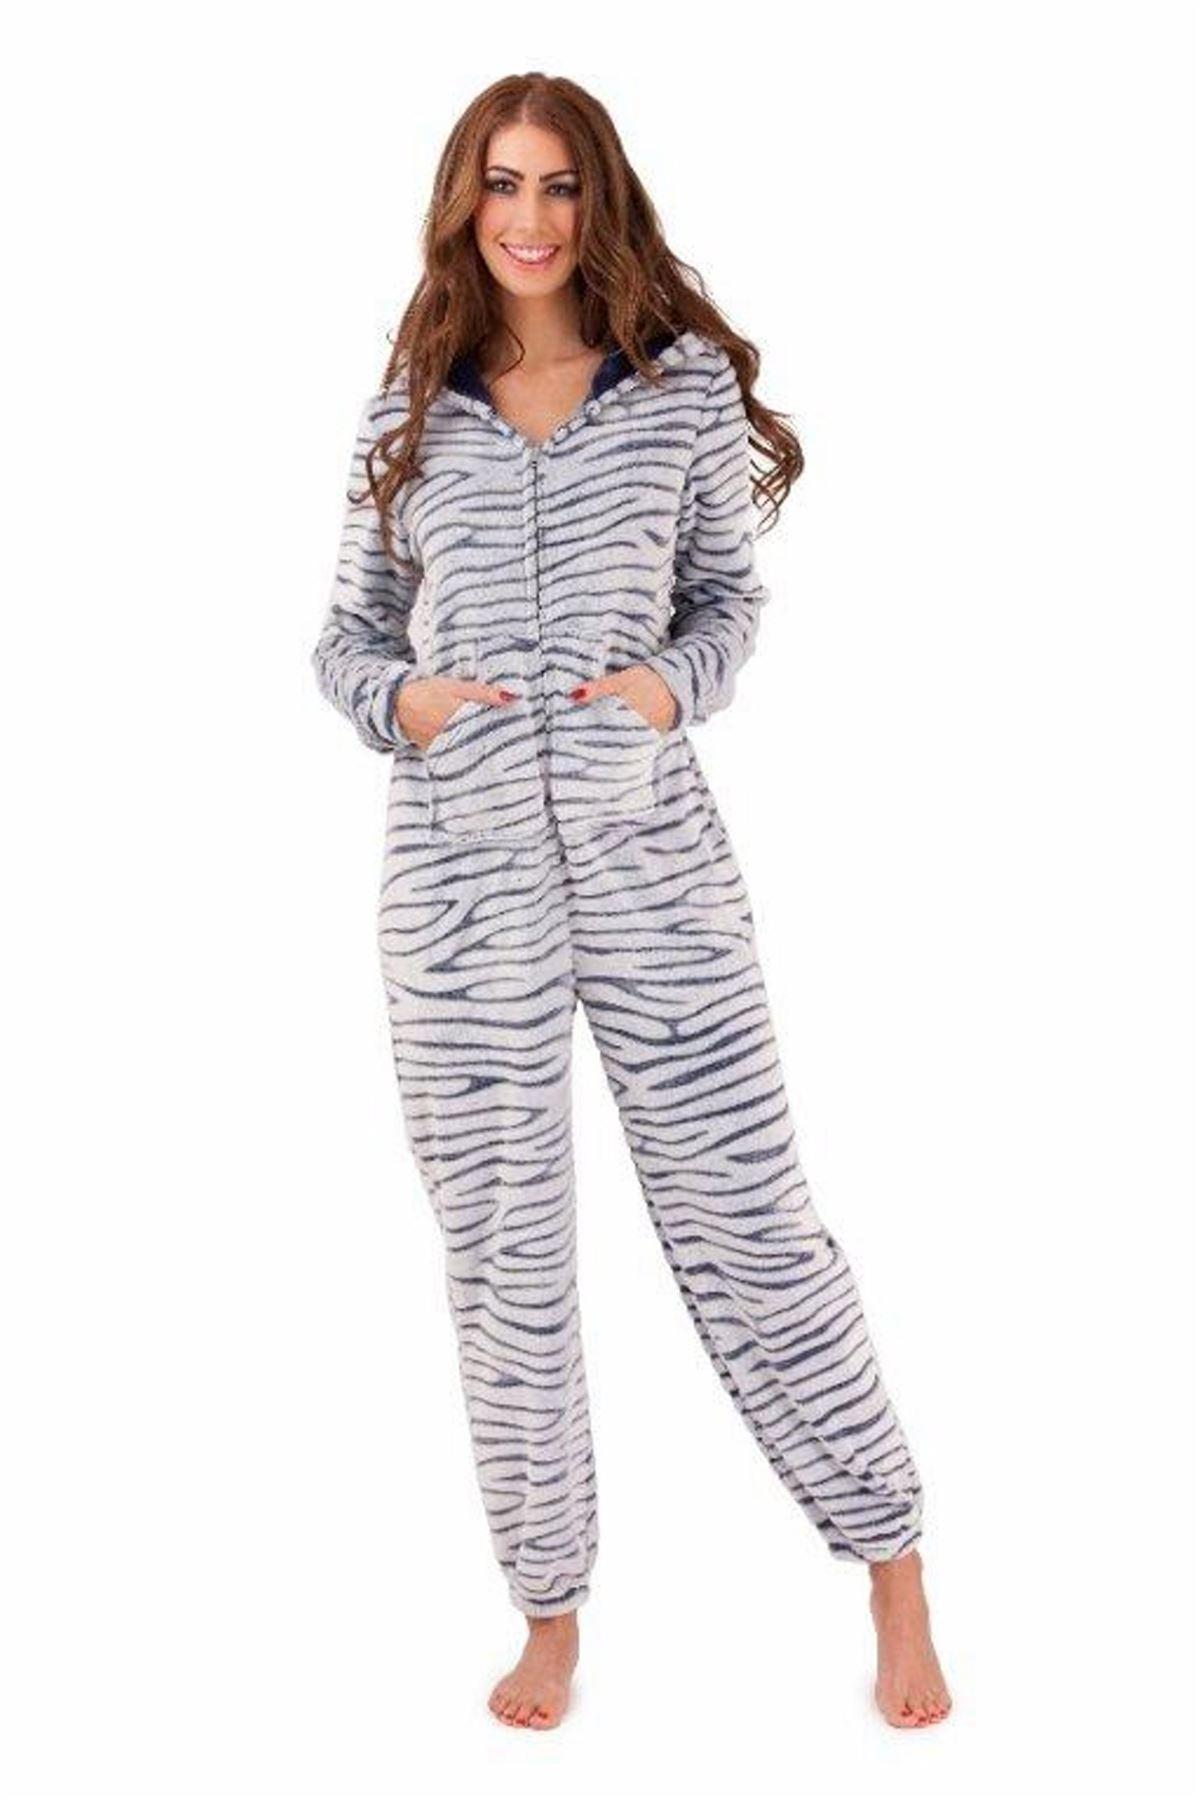 pyjama femme combinaison ultra douce une pi ce capuche 8. Black Bedroom Furniture Sets. Home Design Ideas